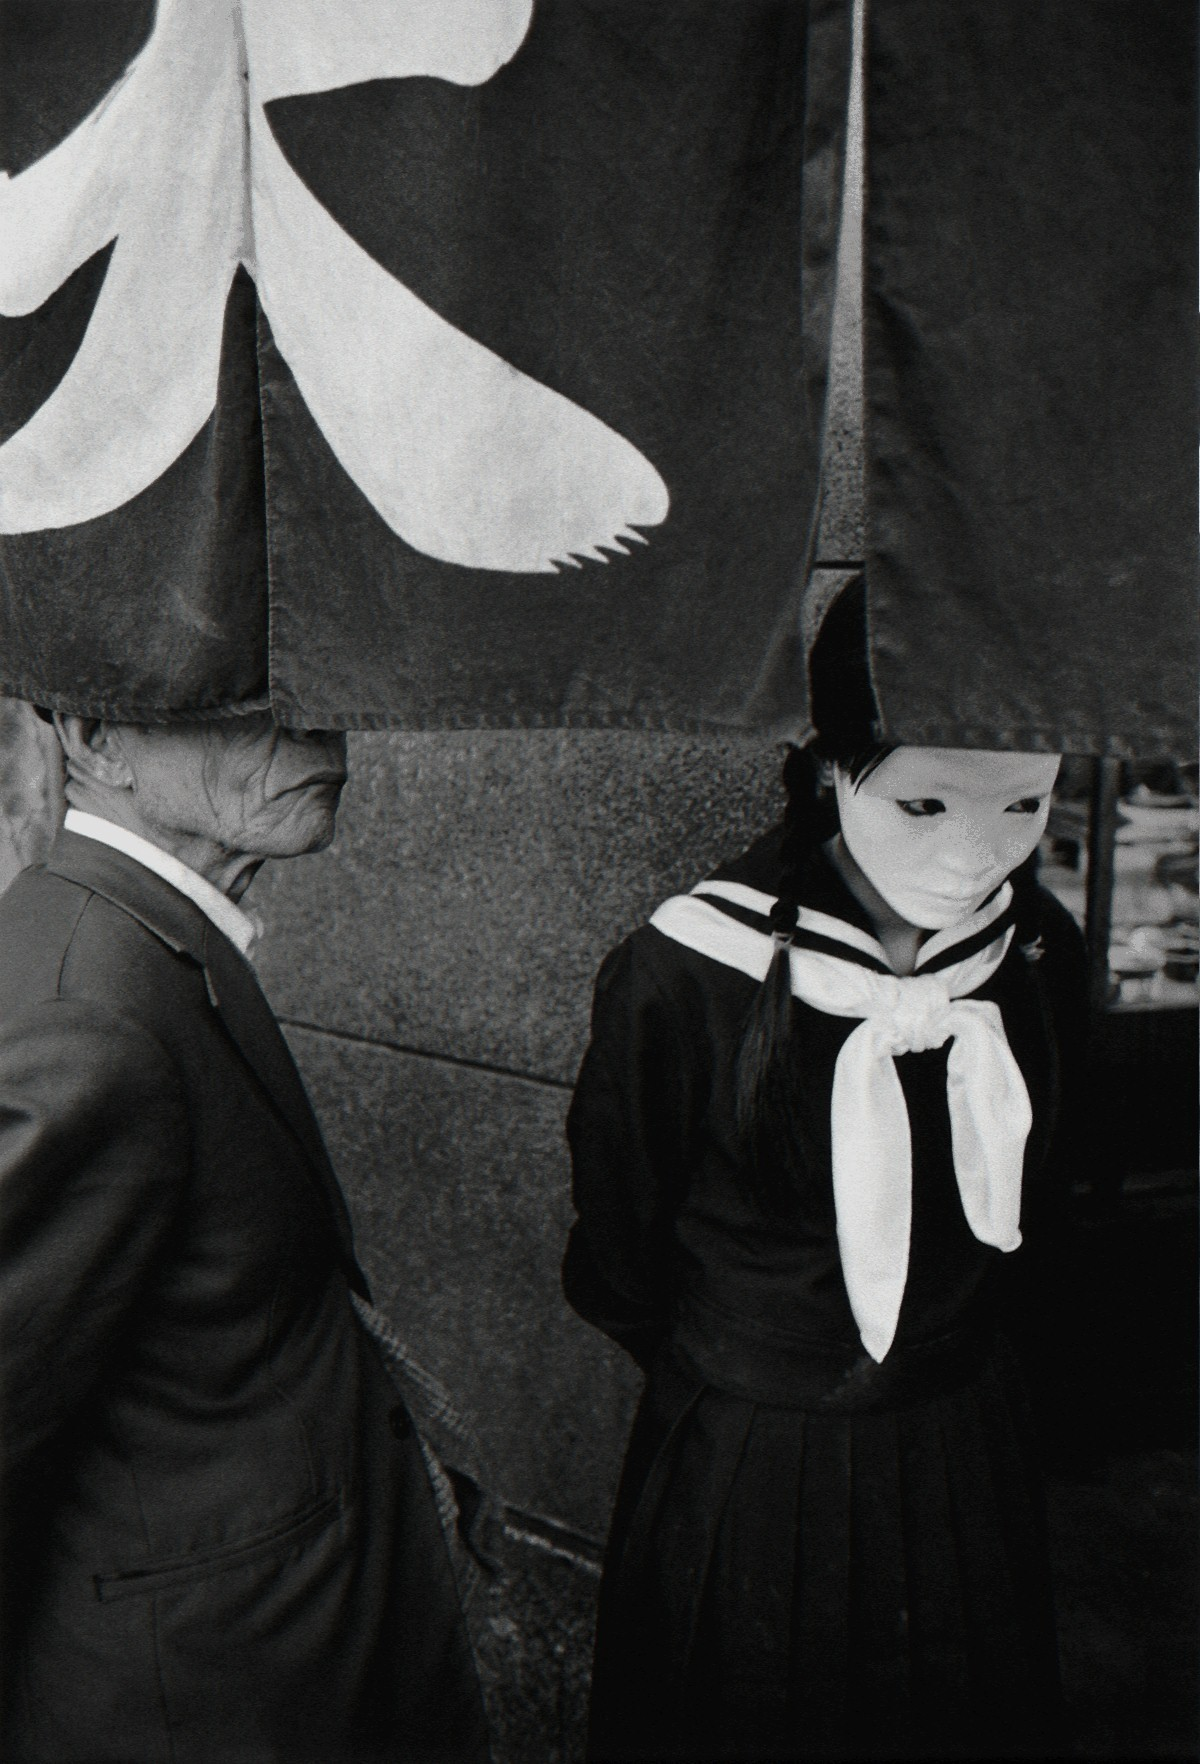 Очевидное отсутствие, Актриса Митико Такахаши, Токио, 1971. Фотограф Сёмэй Томацу